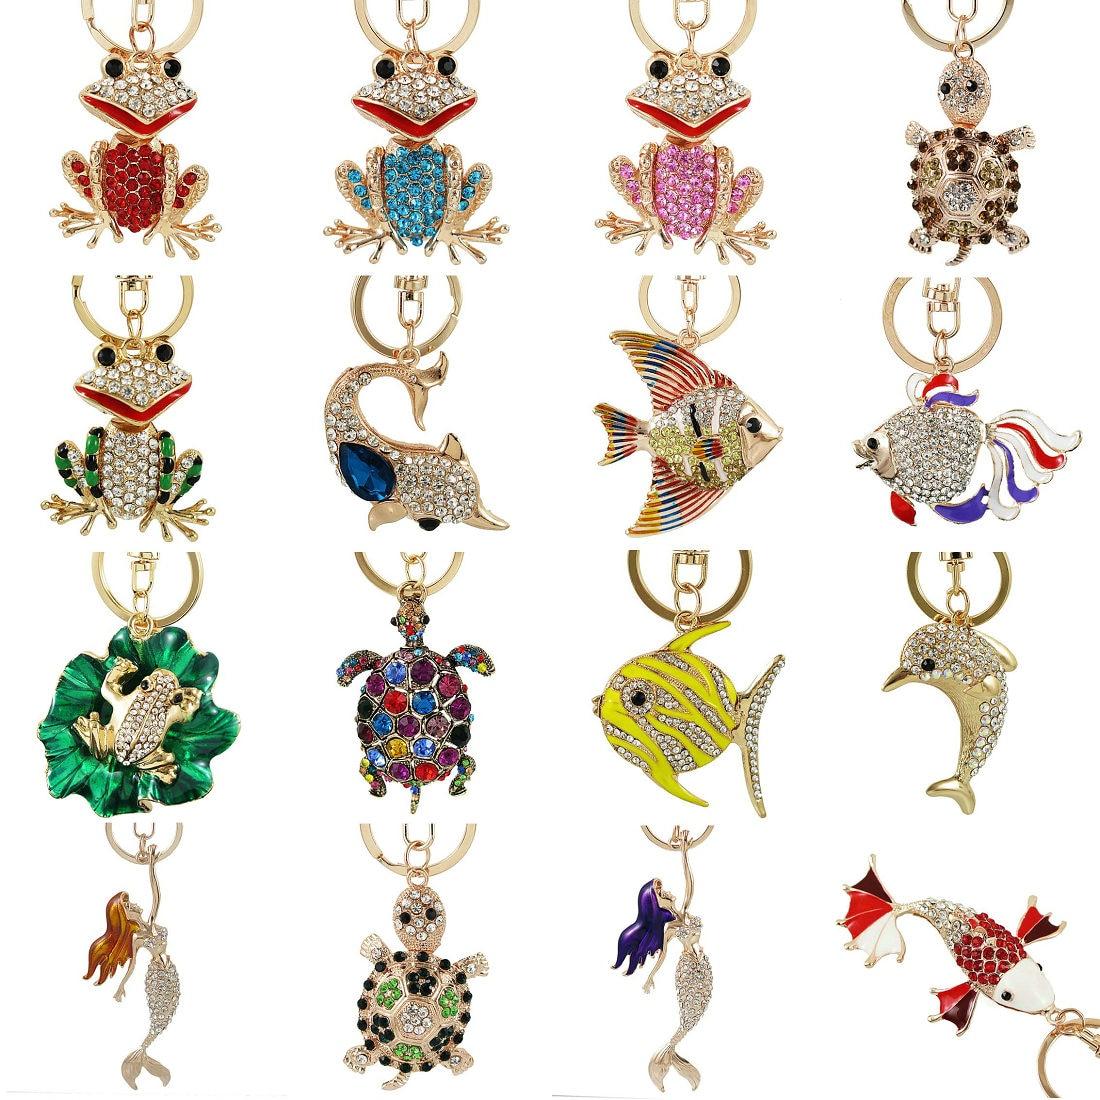 Exquisite Enamel Crystal Fish frog Turtle Key Chains Holder Bag Buckle HandBag Pendant For Car Keyrings KeyChains jewelry